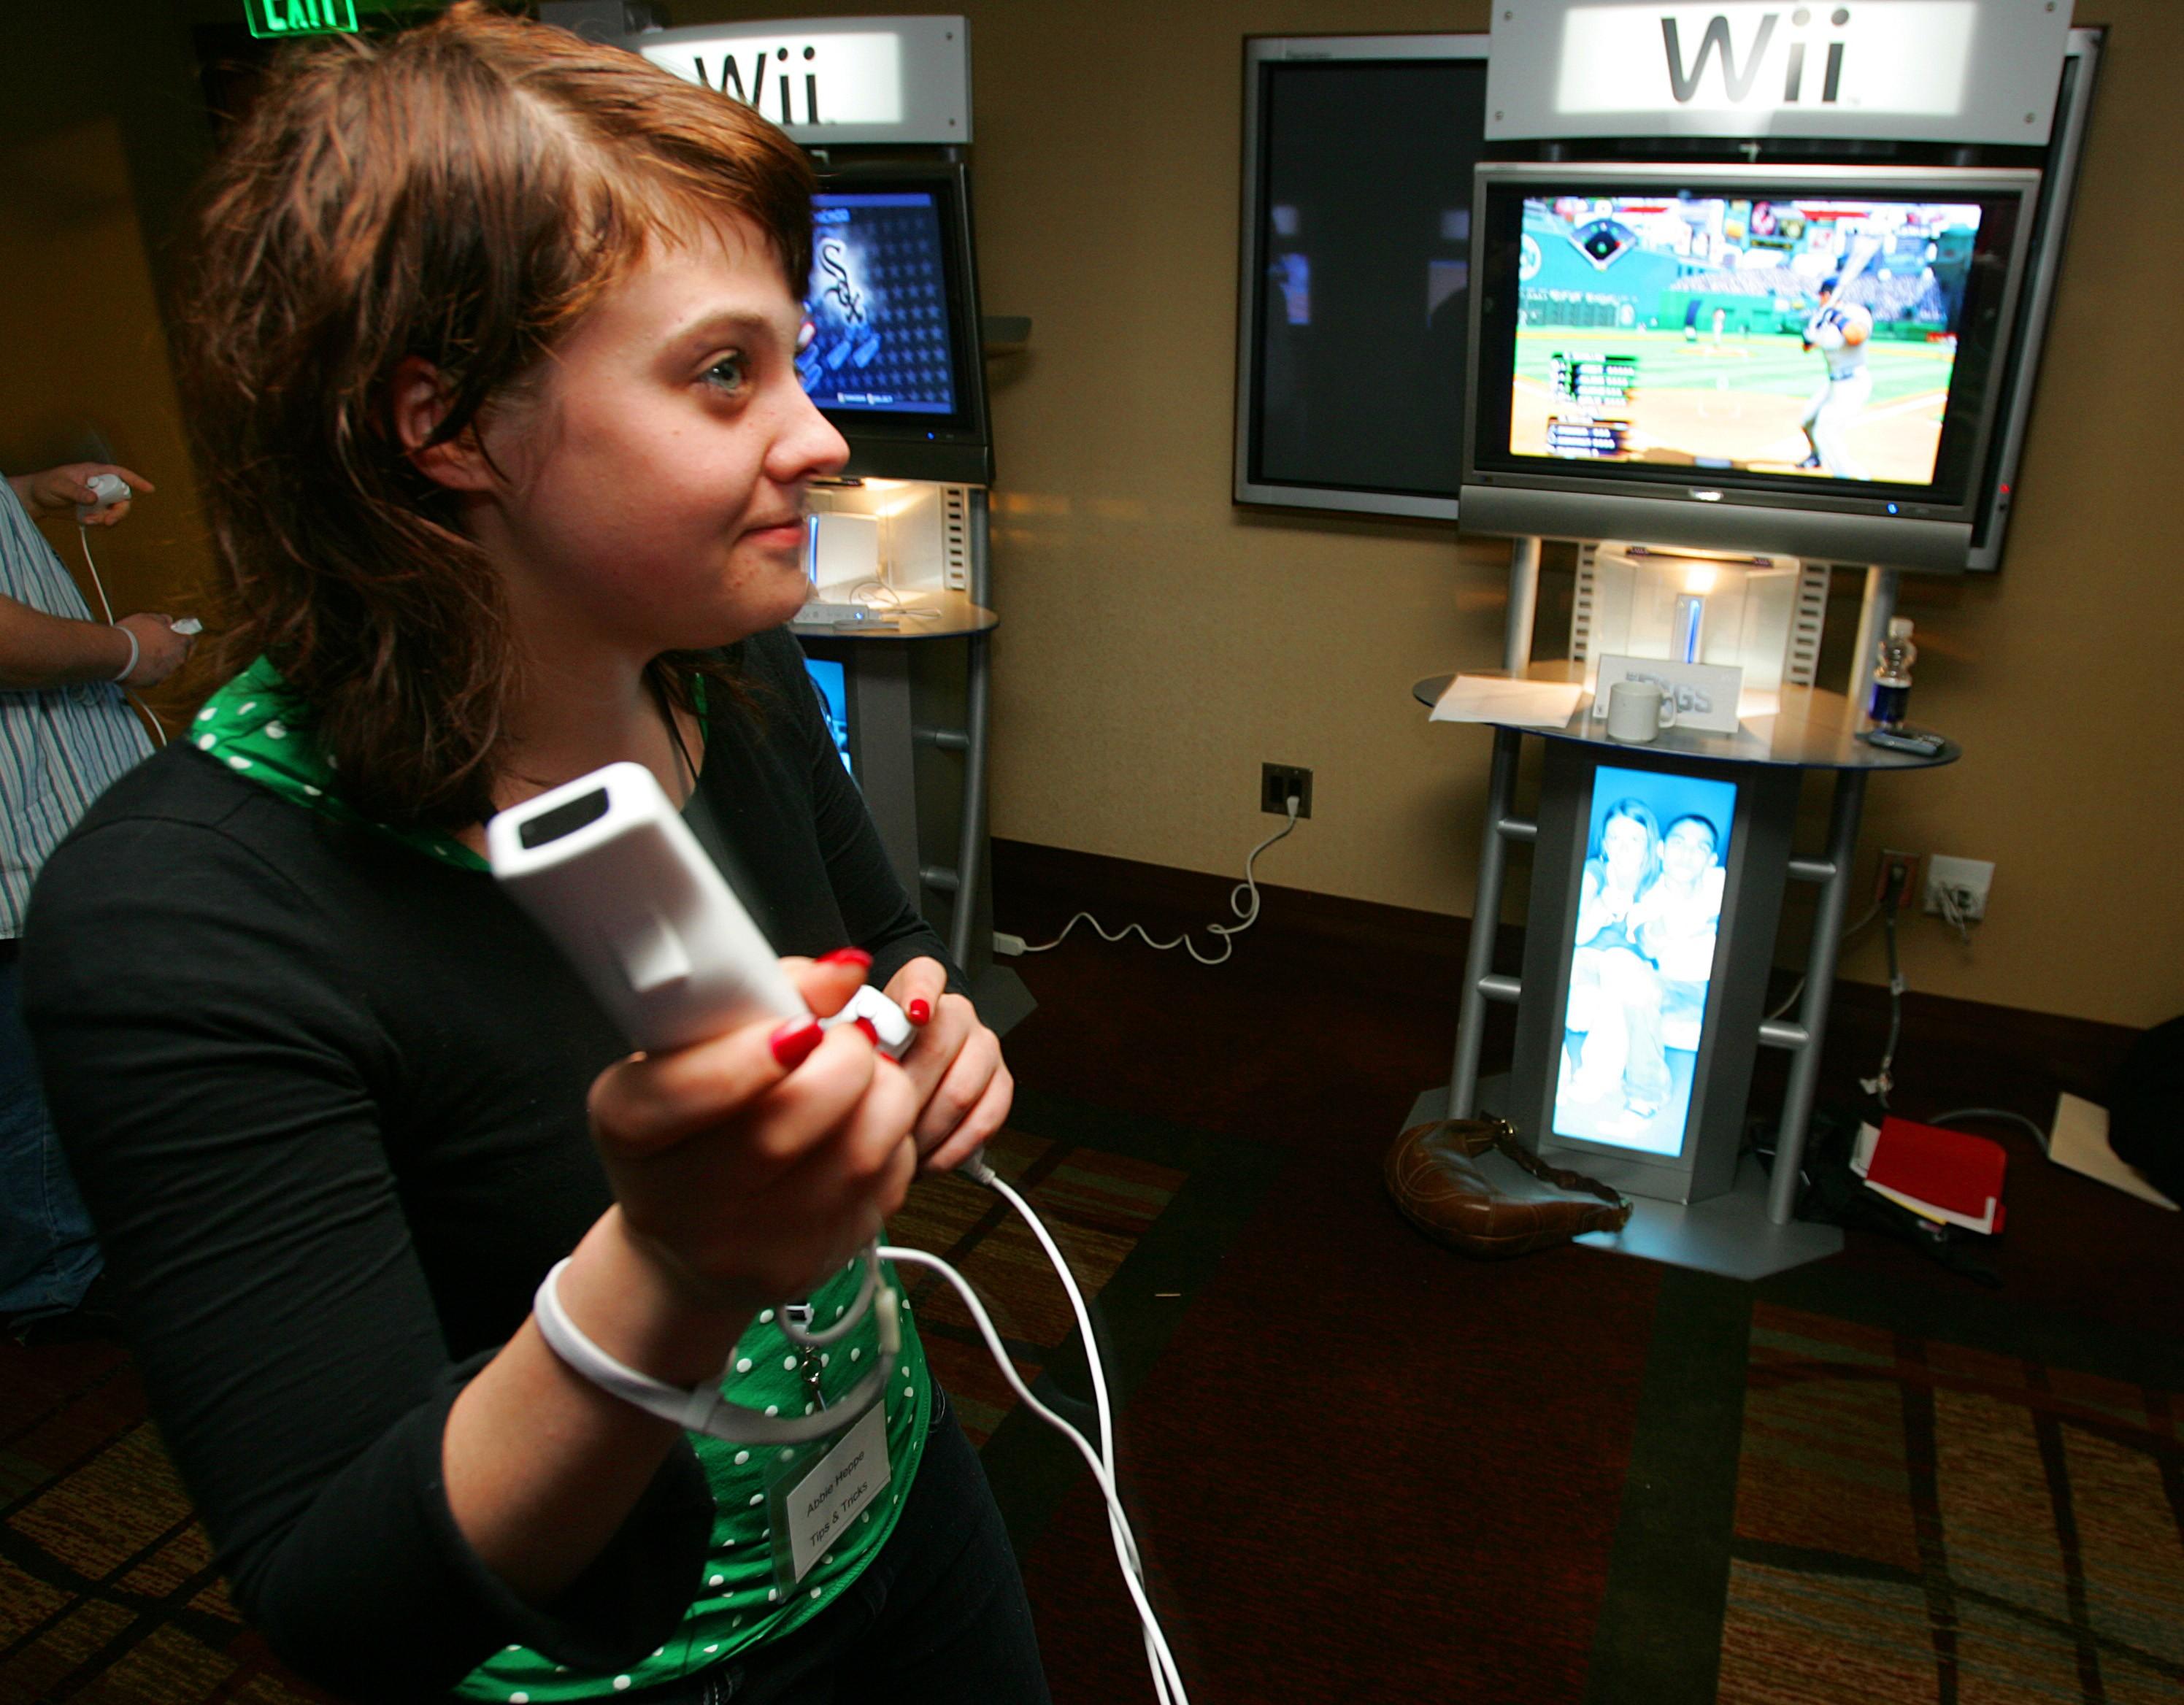 BBC iPlayer set for Nintendo Wii